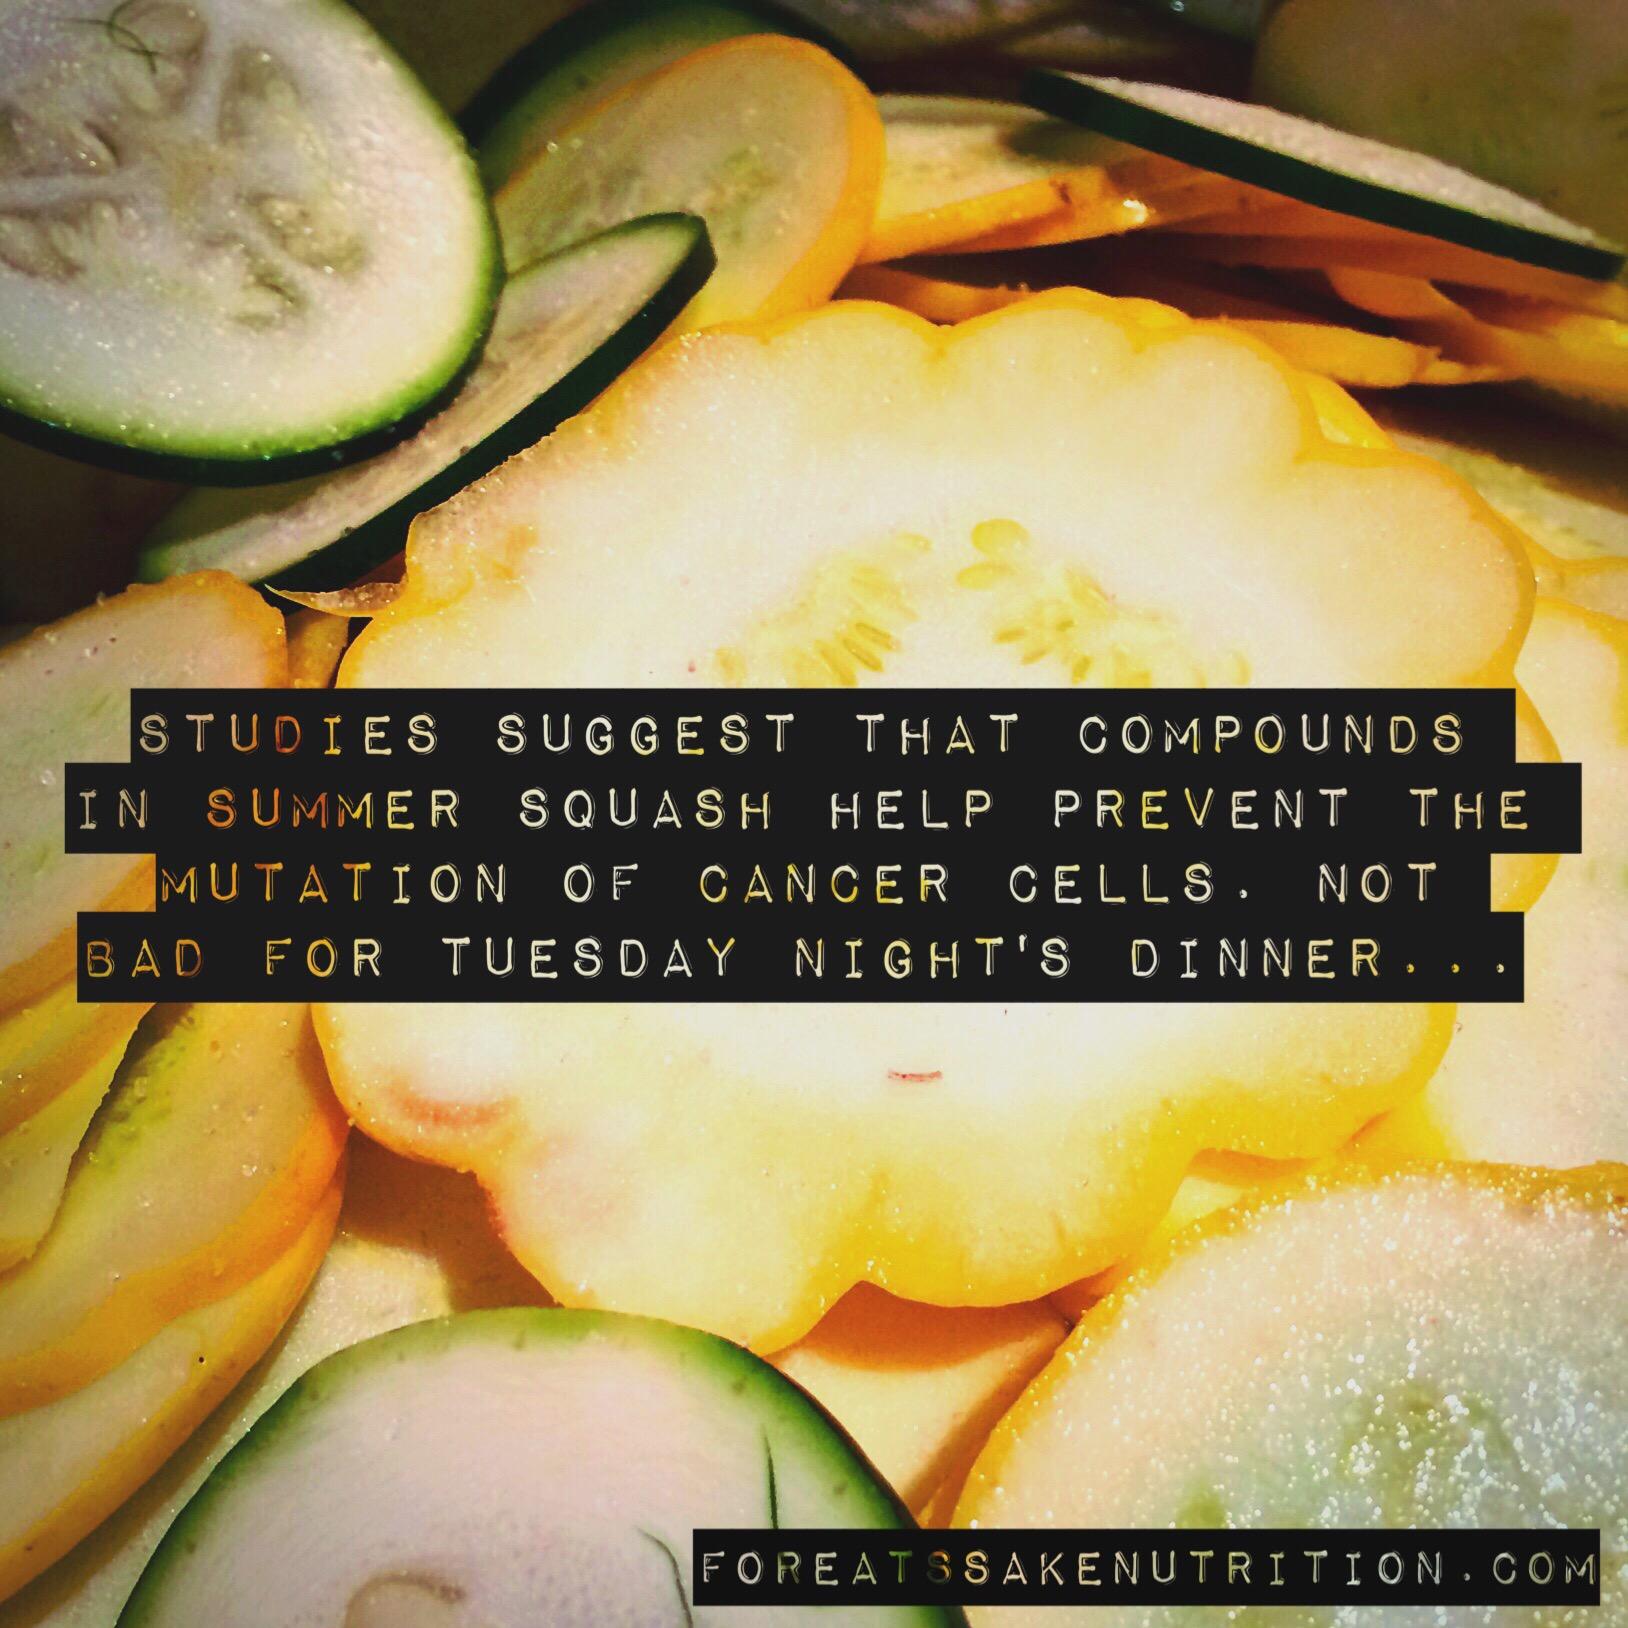 squash zucchini health benefits nutrition cancer